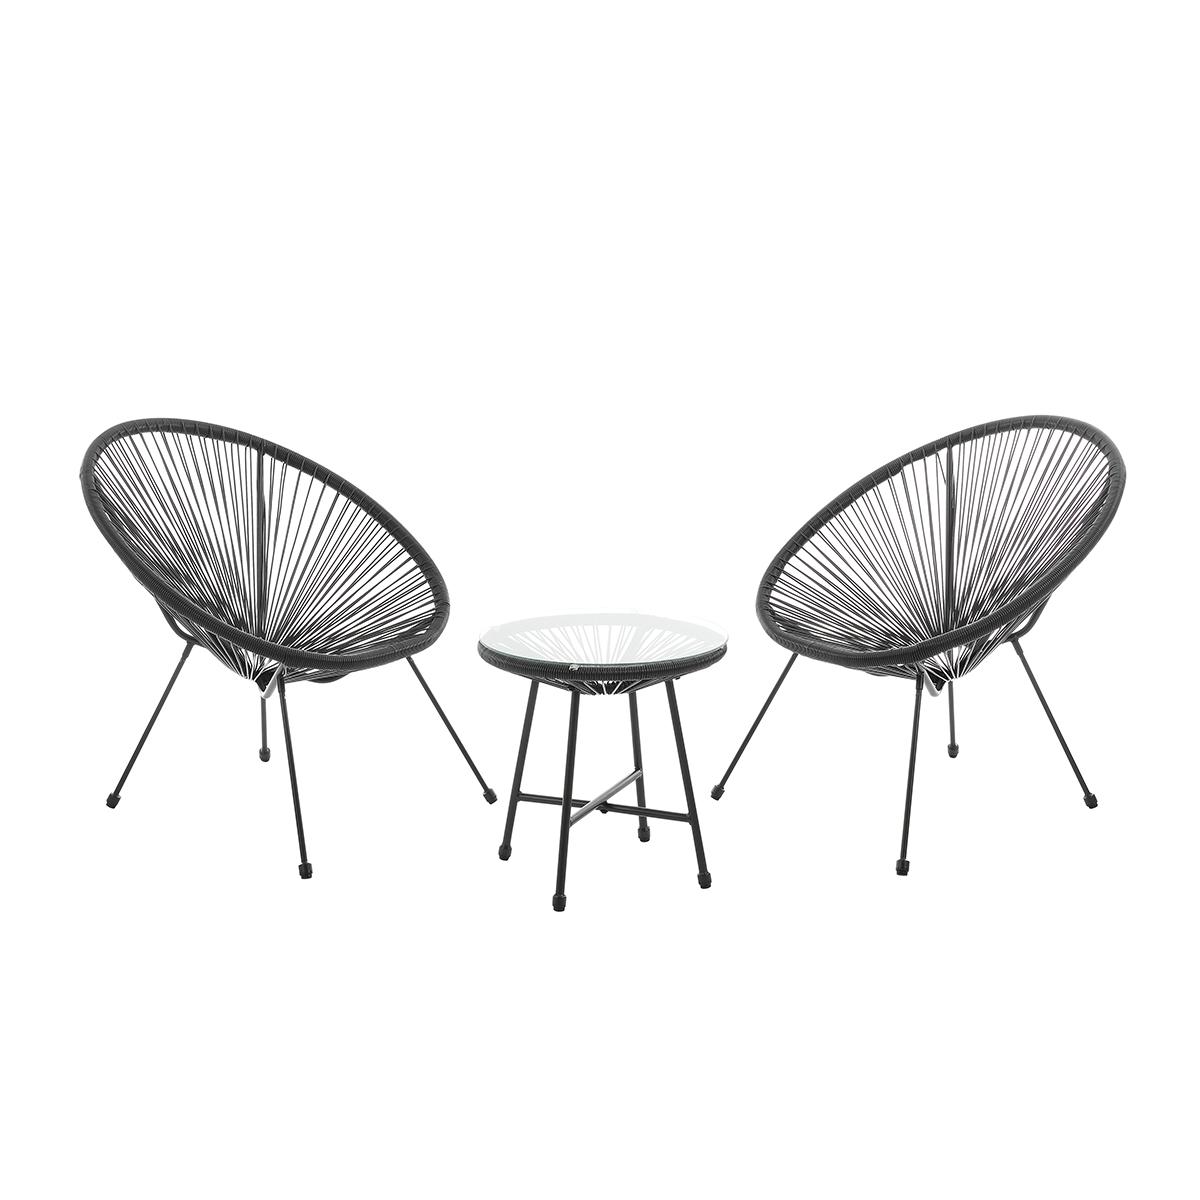 92256 SVITA BALI Balkon-Möbel 3-tlg. Polyrattan Lounge-Set Balkon-Set Schwarz